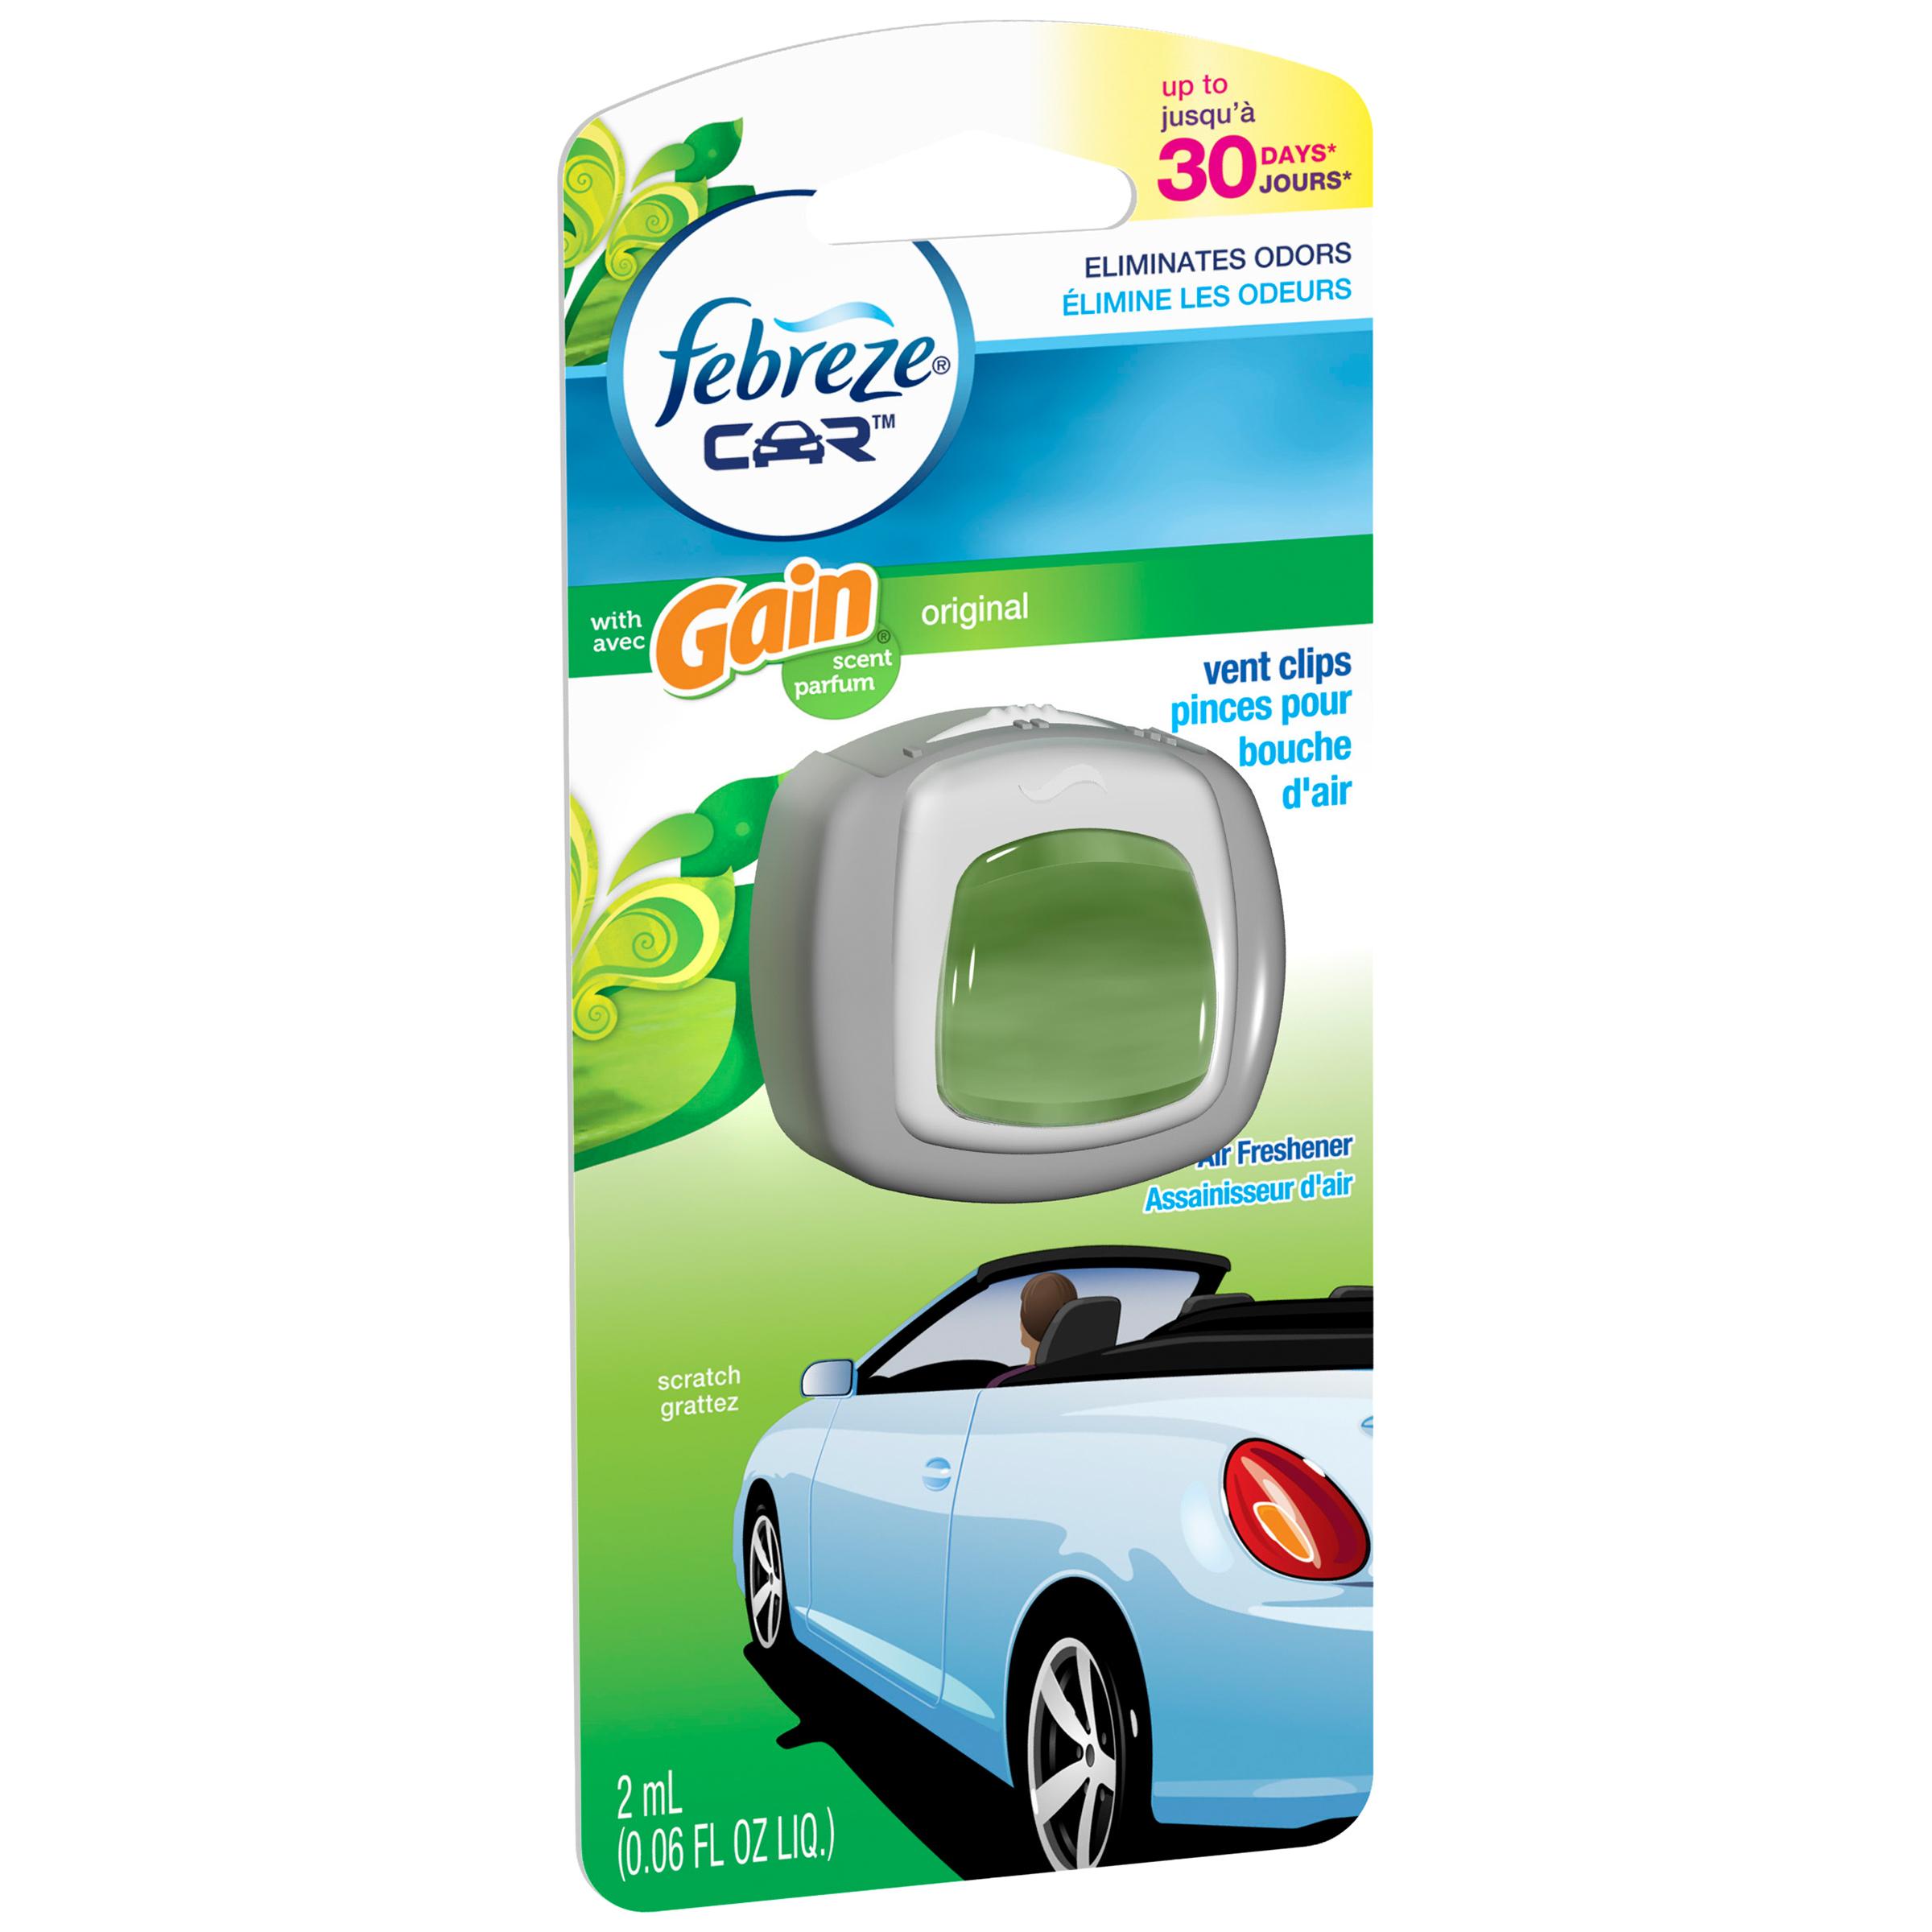 Febreze CAR Vent Clip with Gain Original Air Freshener 1 Count, 2 mL PartNumber: 029W001313192001P KsnValue: 1313192 MfgPartNumber: 94721